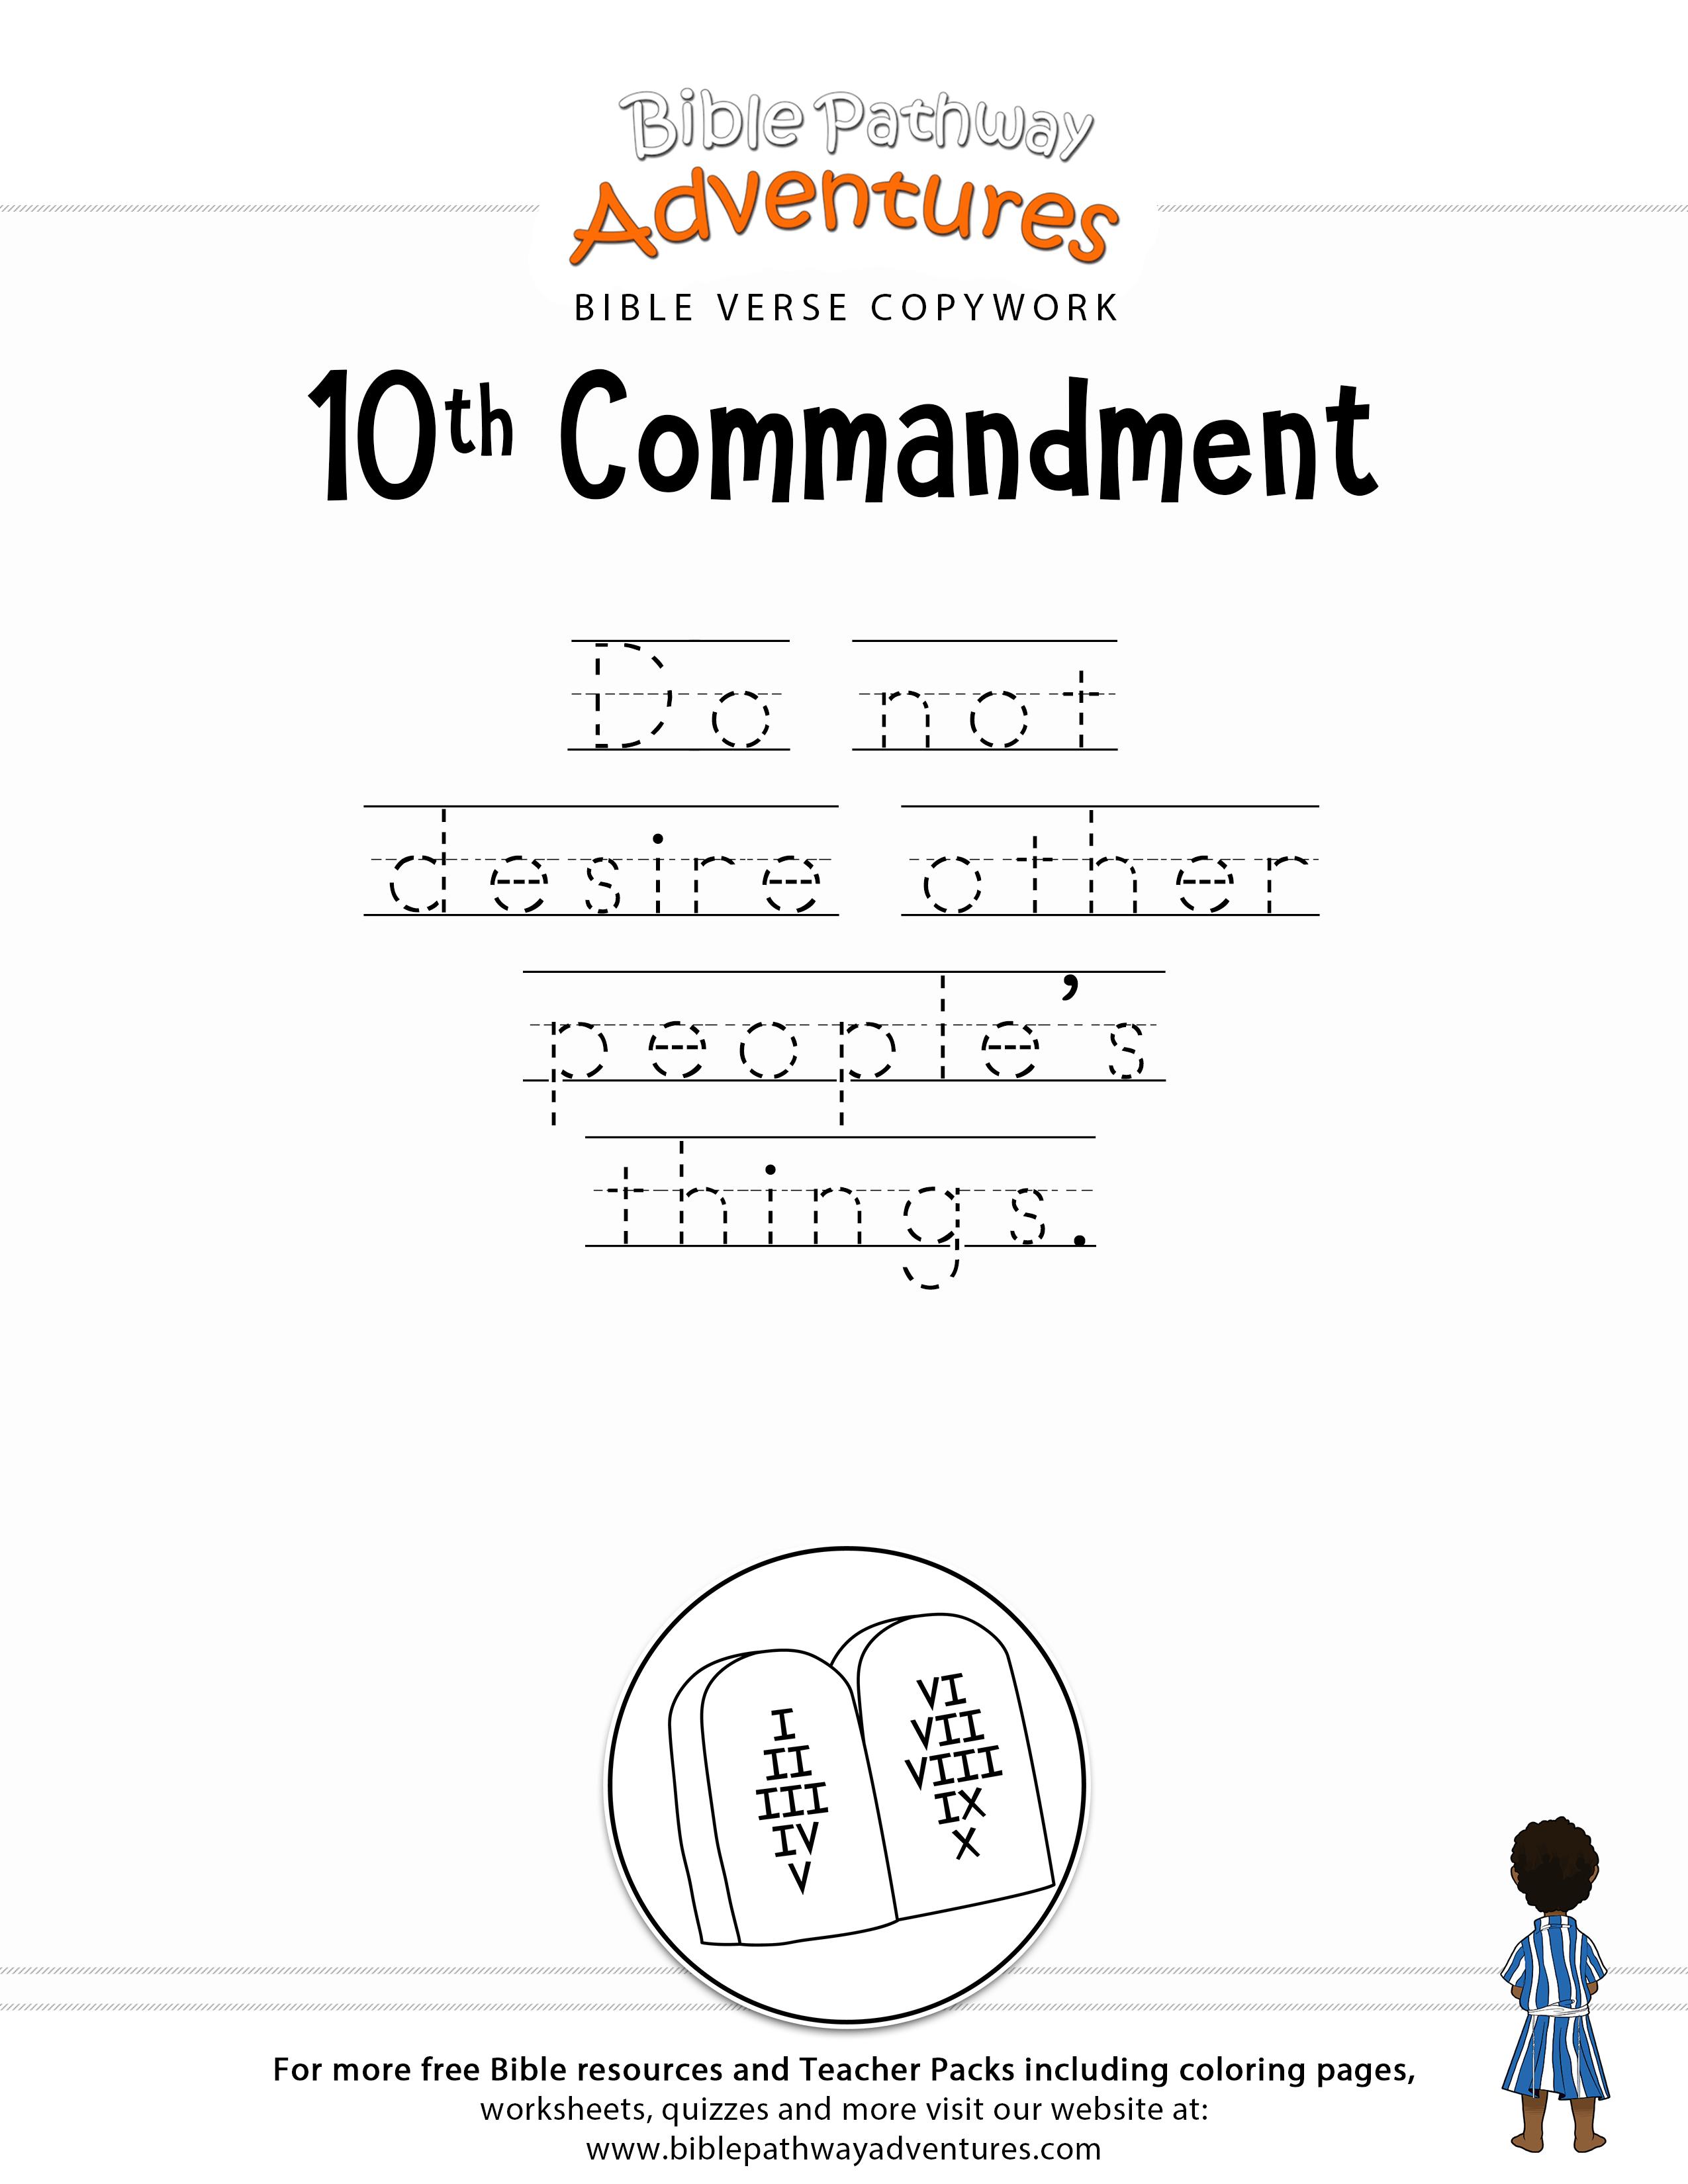 10th Commandment Copywork